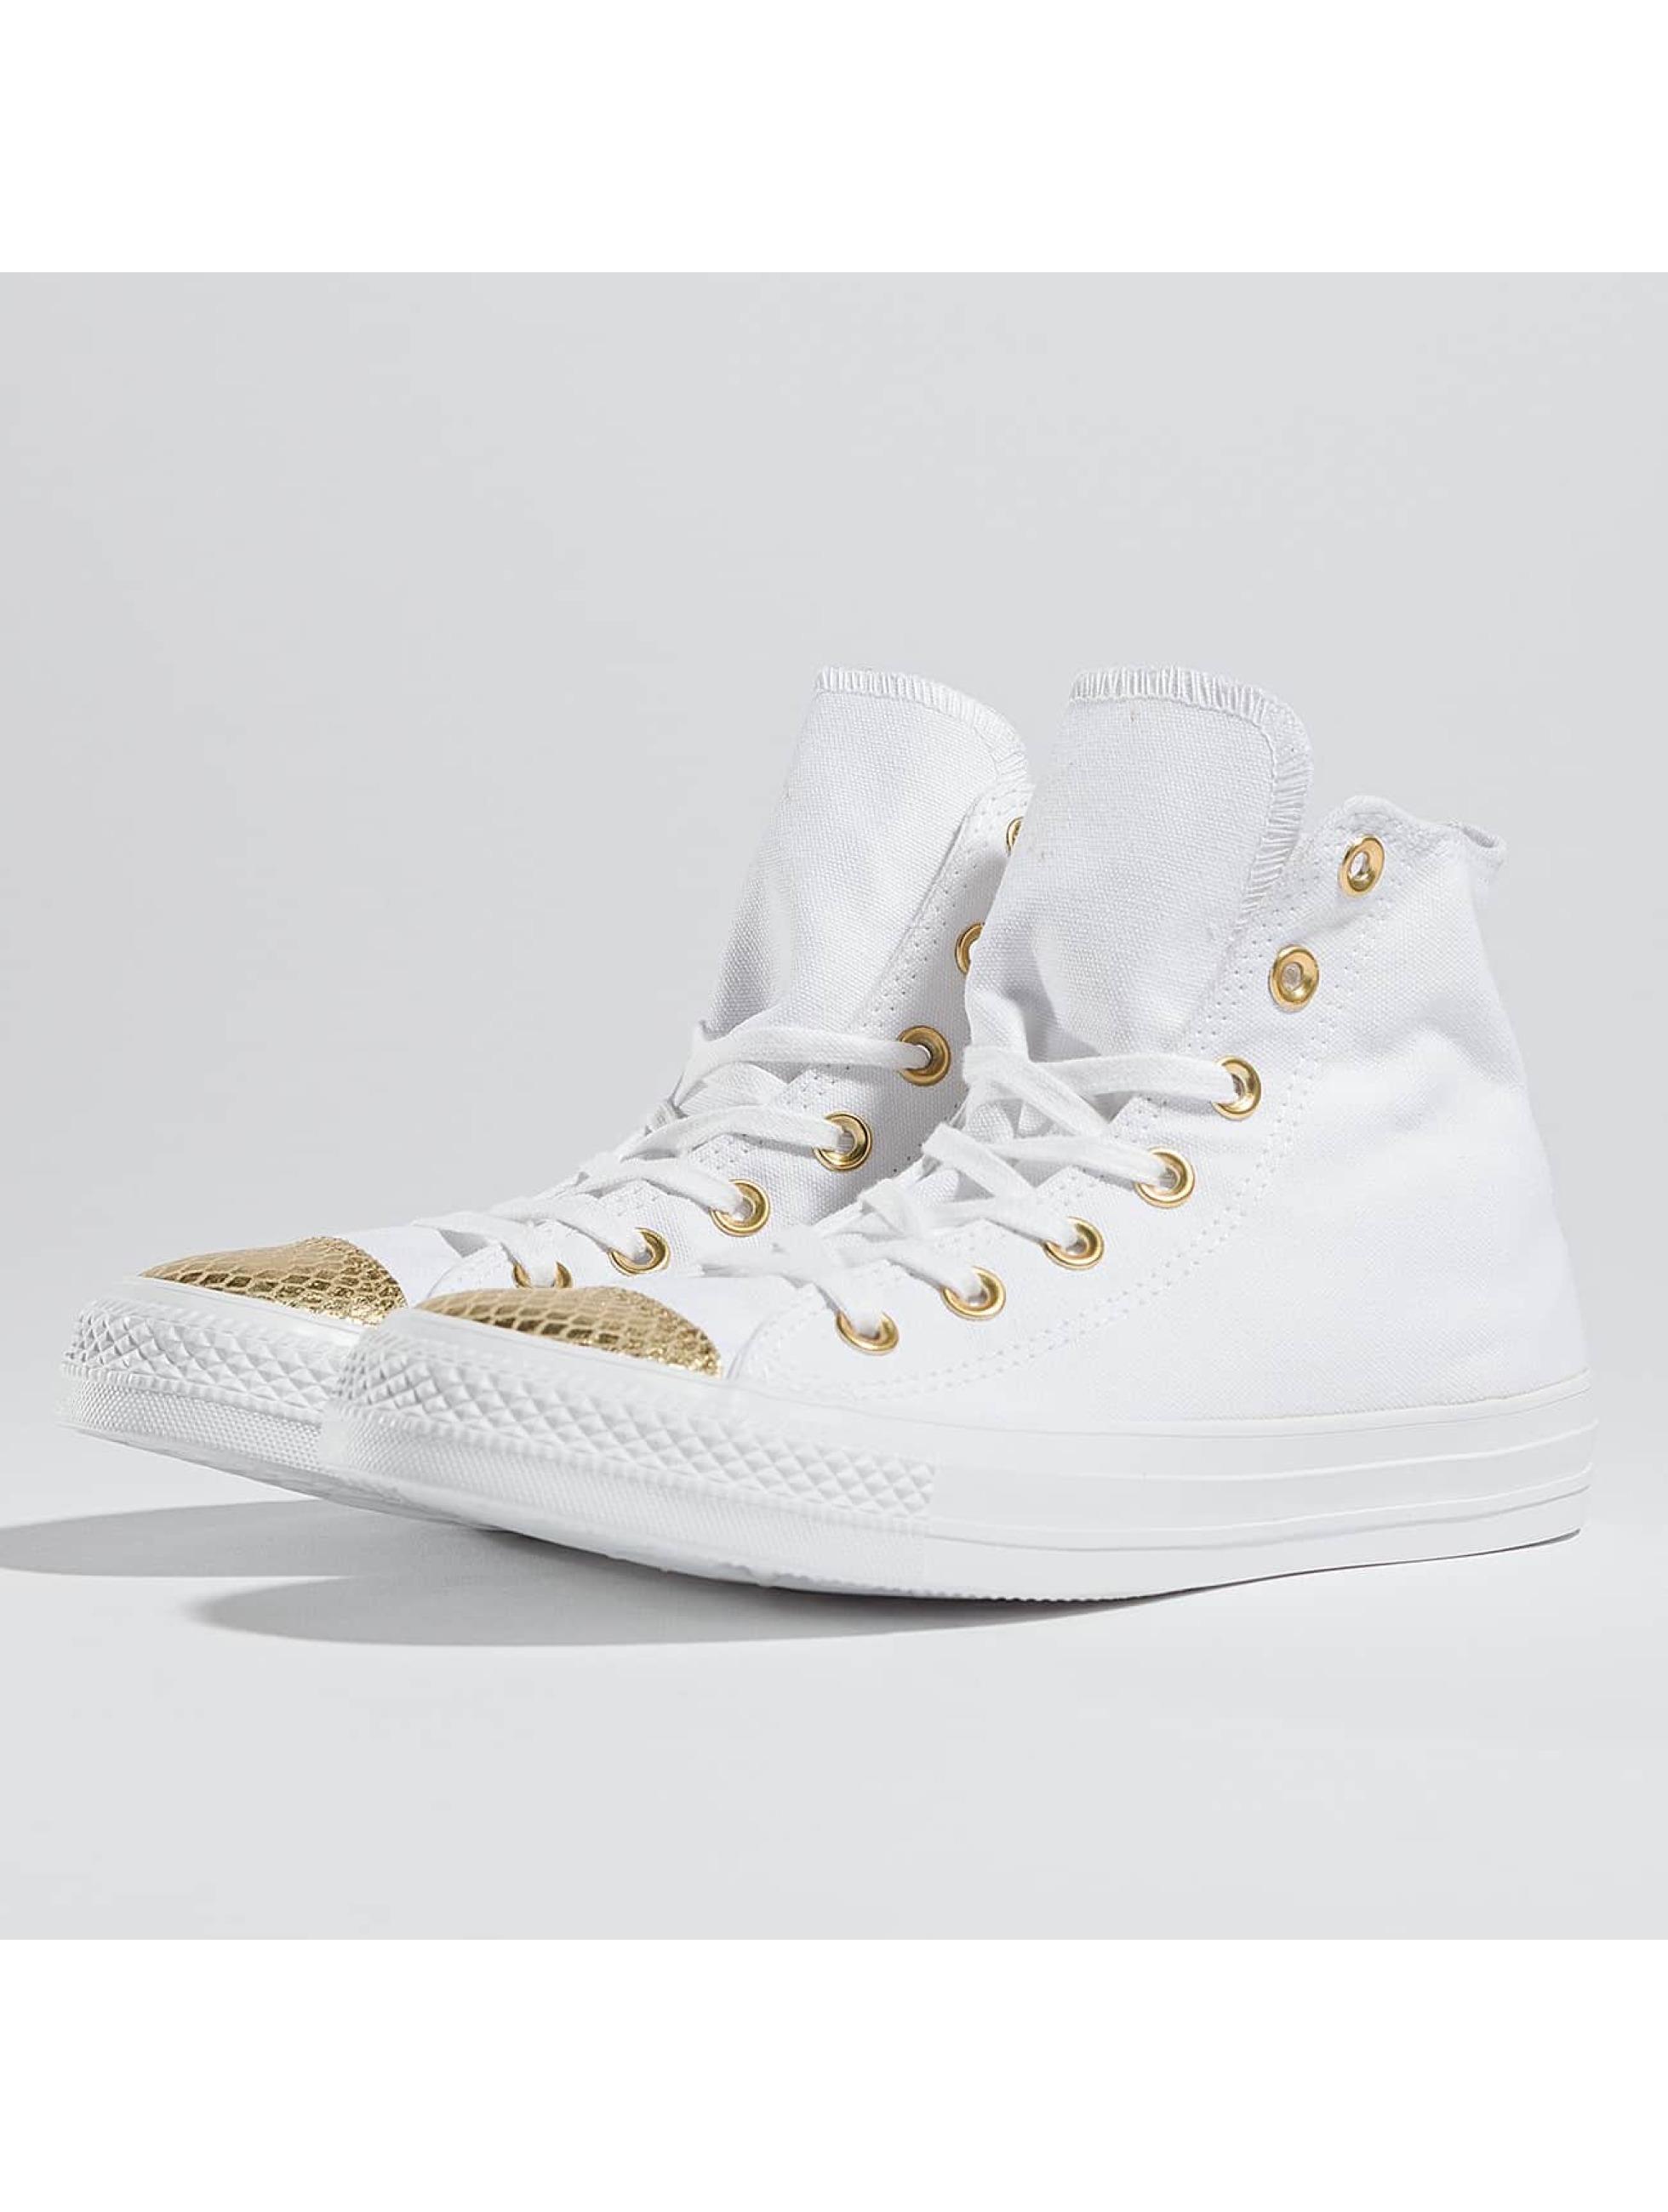 Converse Männer Sneaker Chuck Taylor All Star Hil in weiß